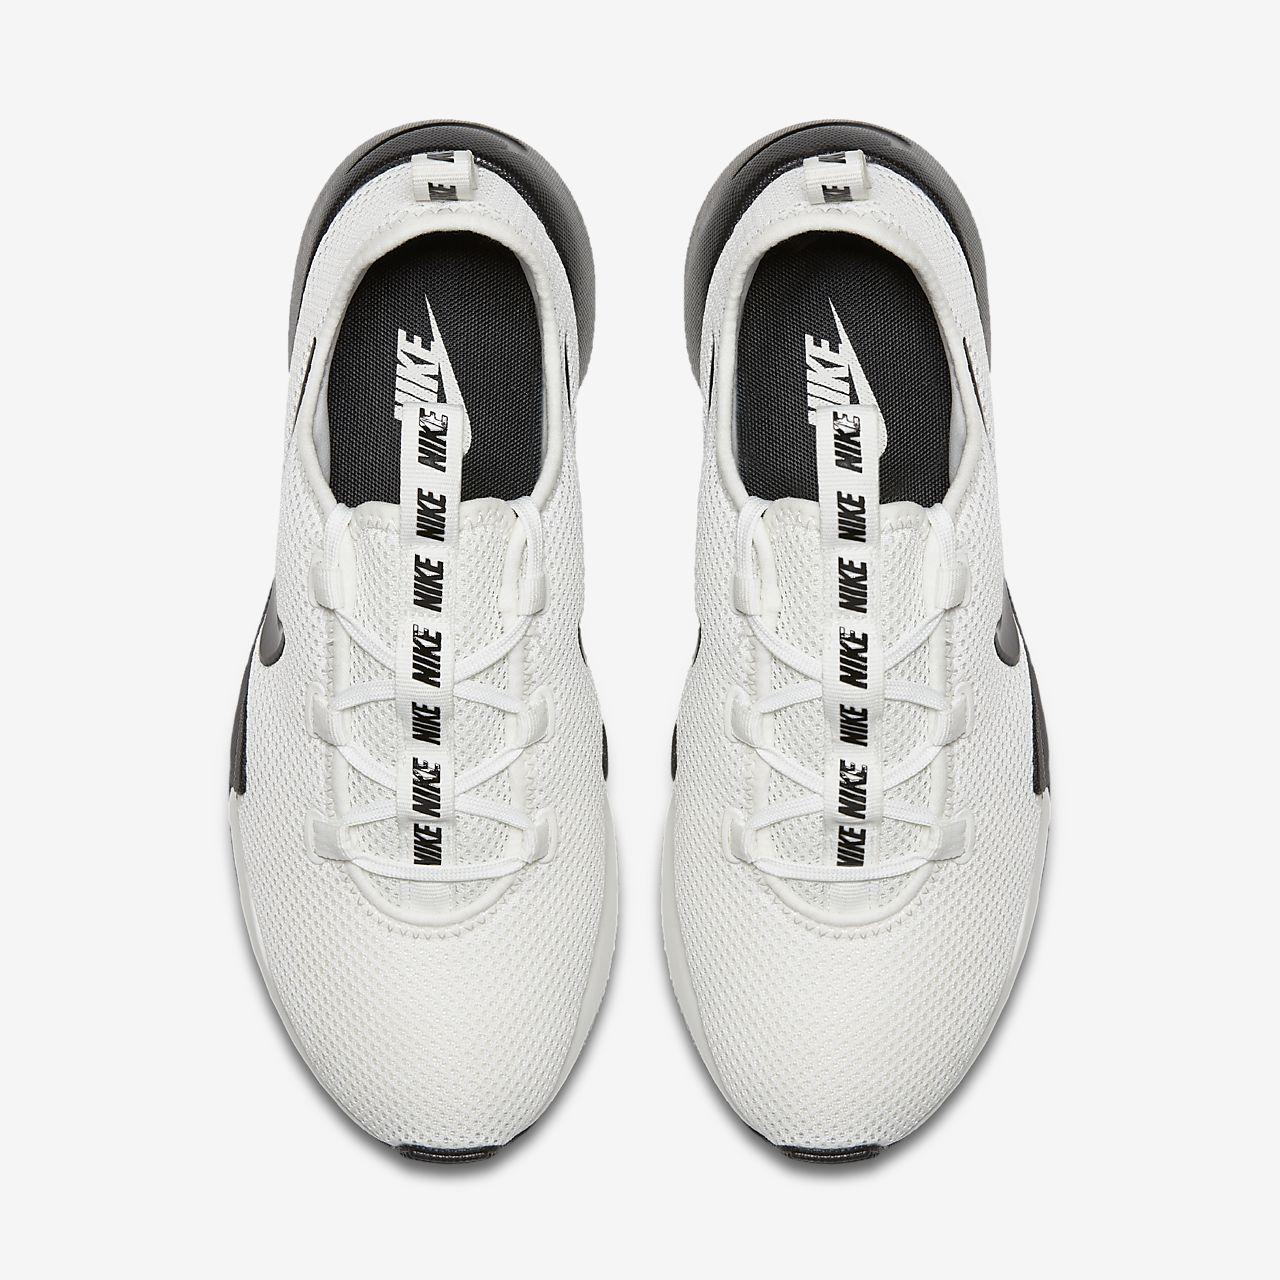 nike ashin modern lx blanc argent chaussures chaussures chaussures on vente 0f088d